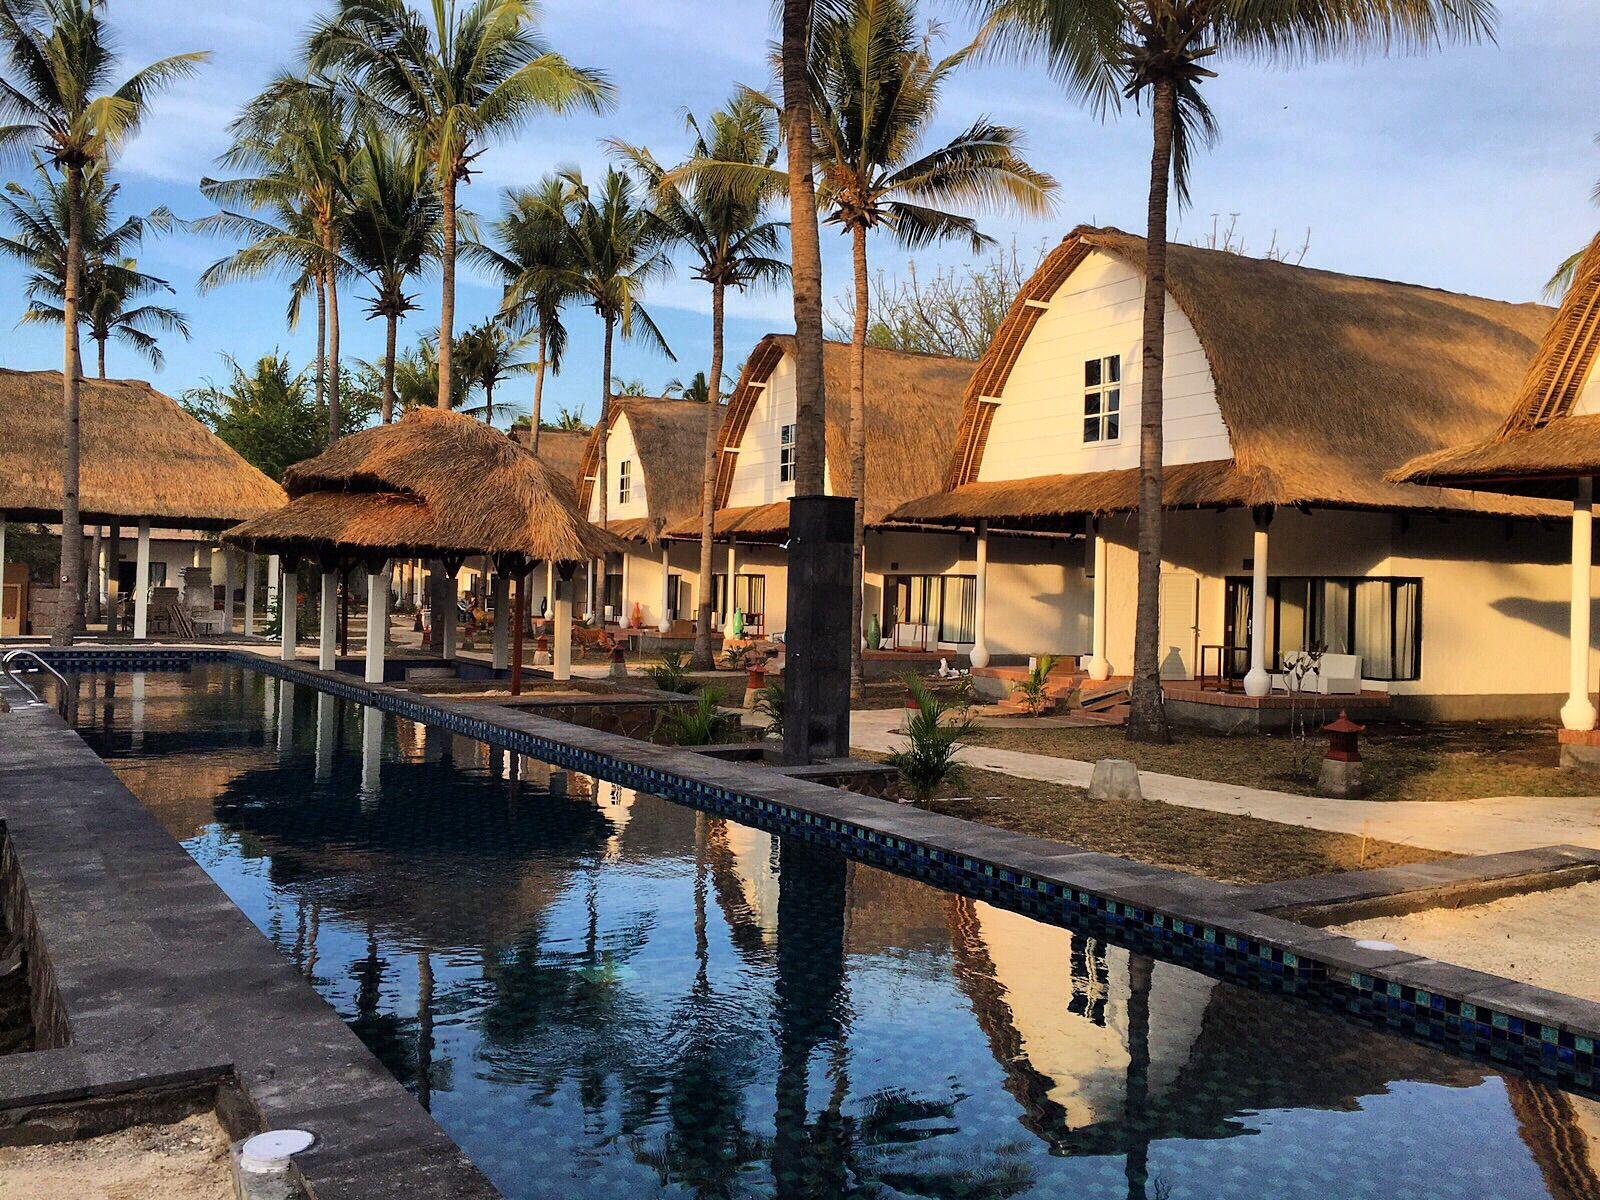 Oceano Jambuluwuk Resort Gili Trawangan, Kepulauan Gili